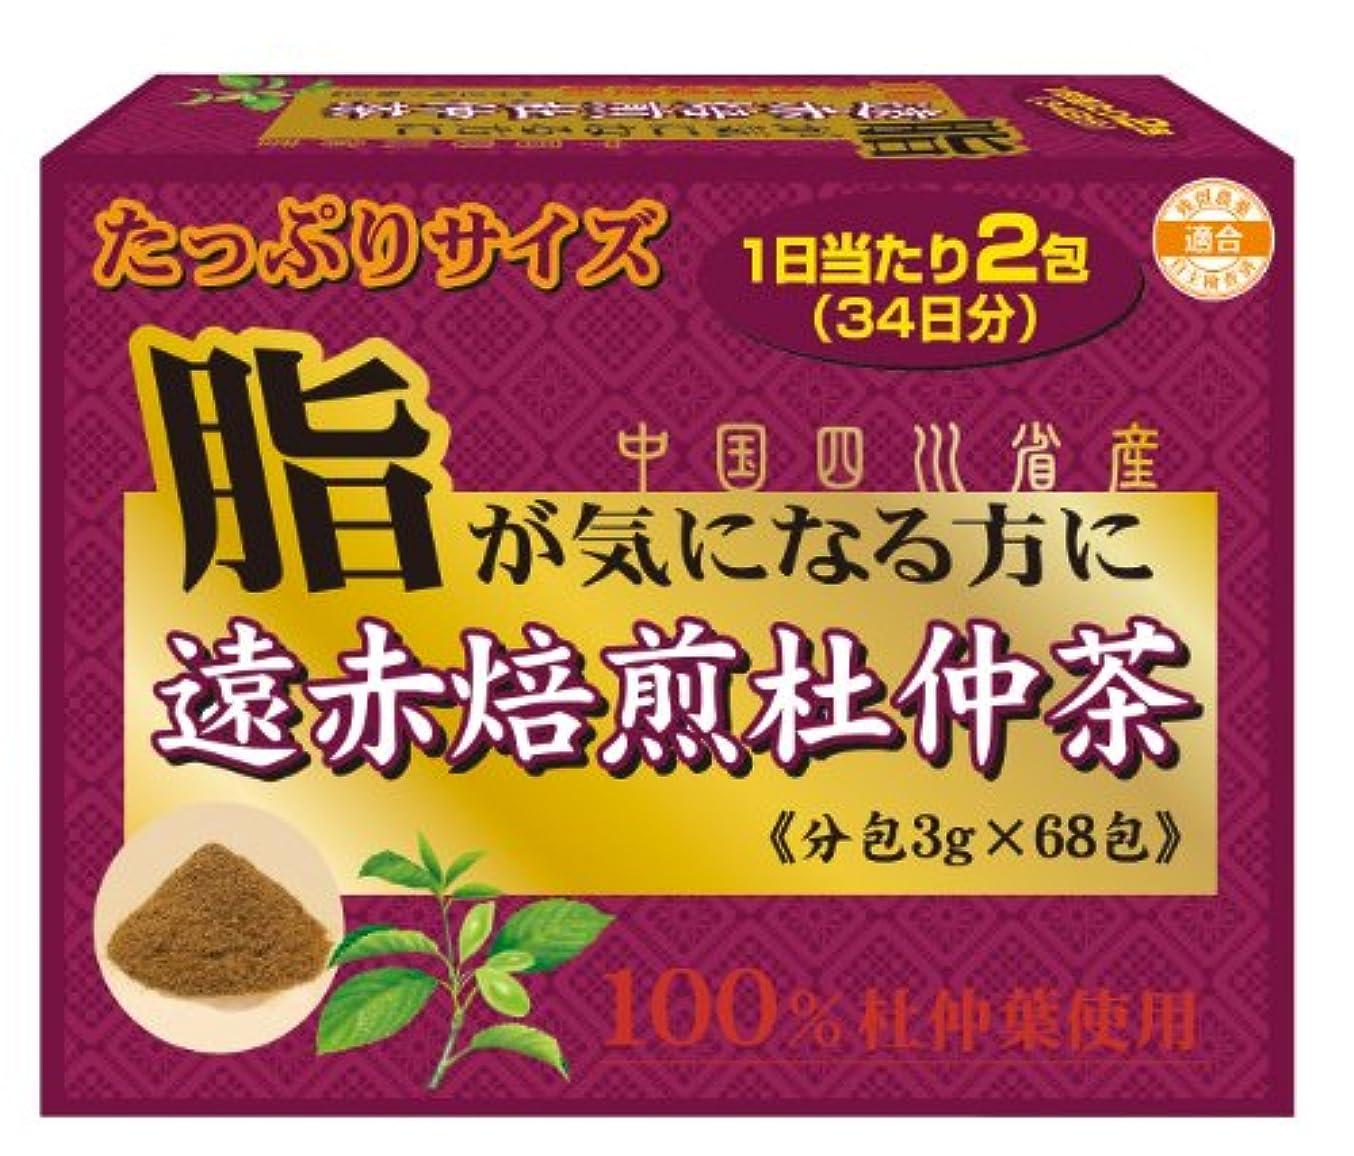 巡礼者是正する軽食ユーワ 遠赤焙煎杜仲茶 3g×68包